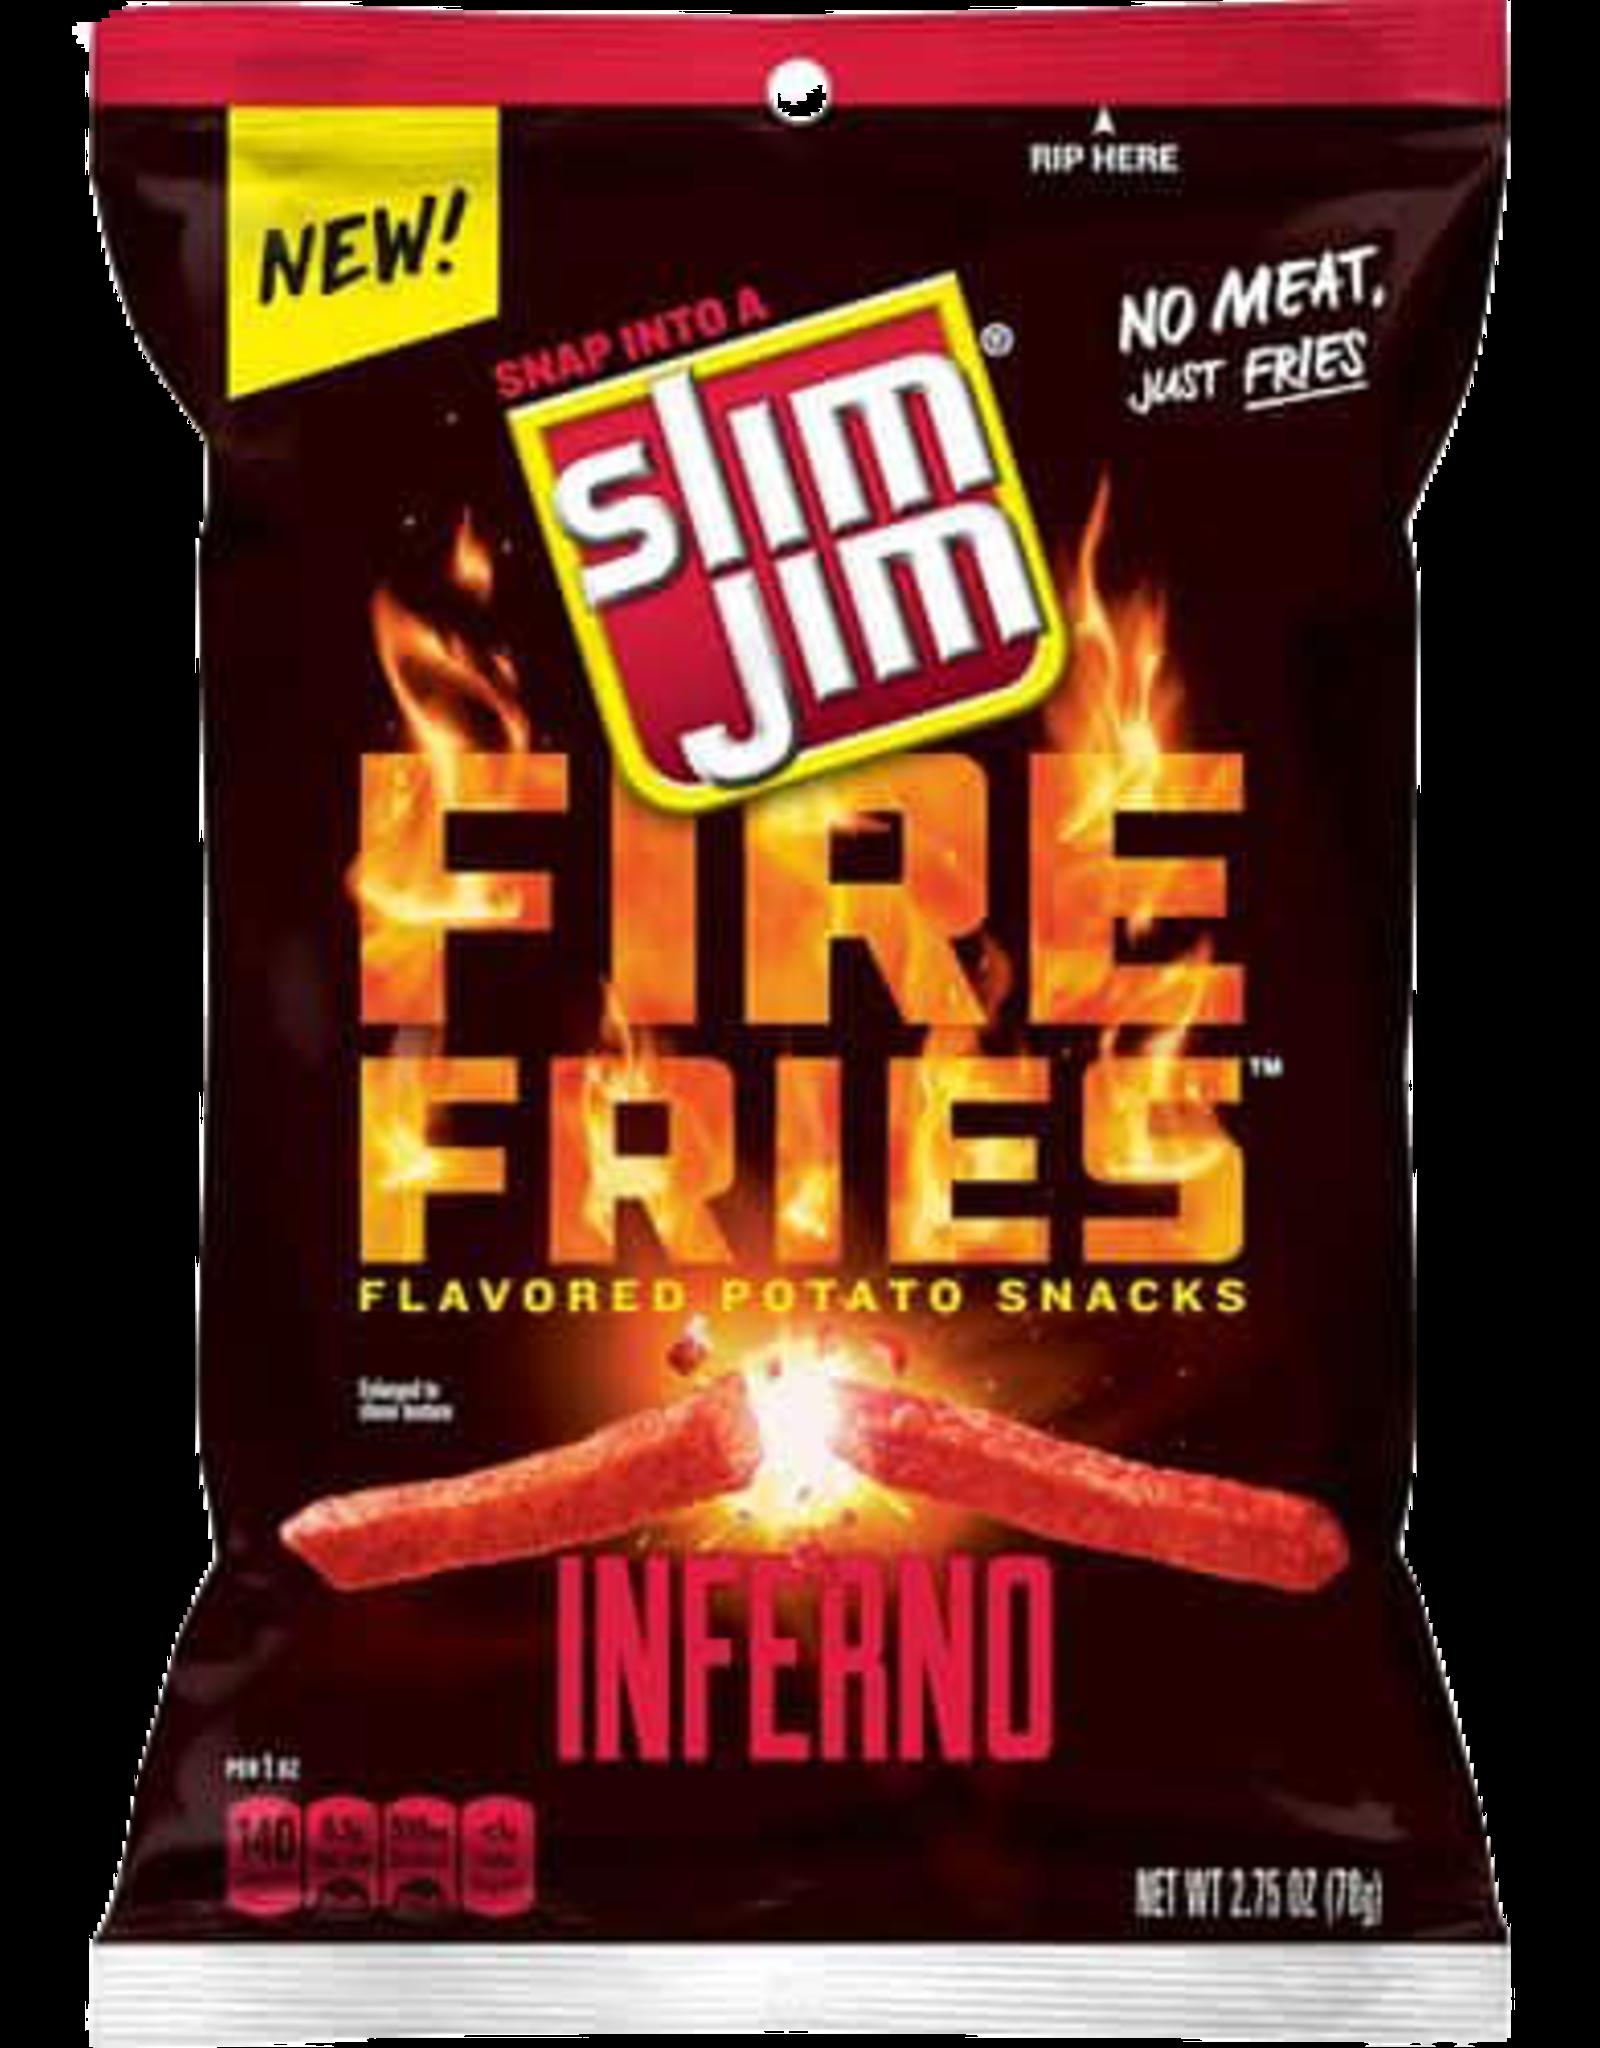 Slim Jim Fire Fries Inferno